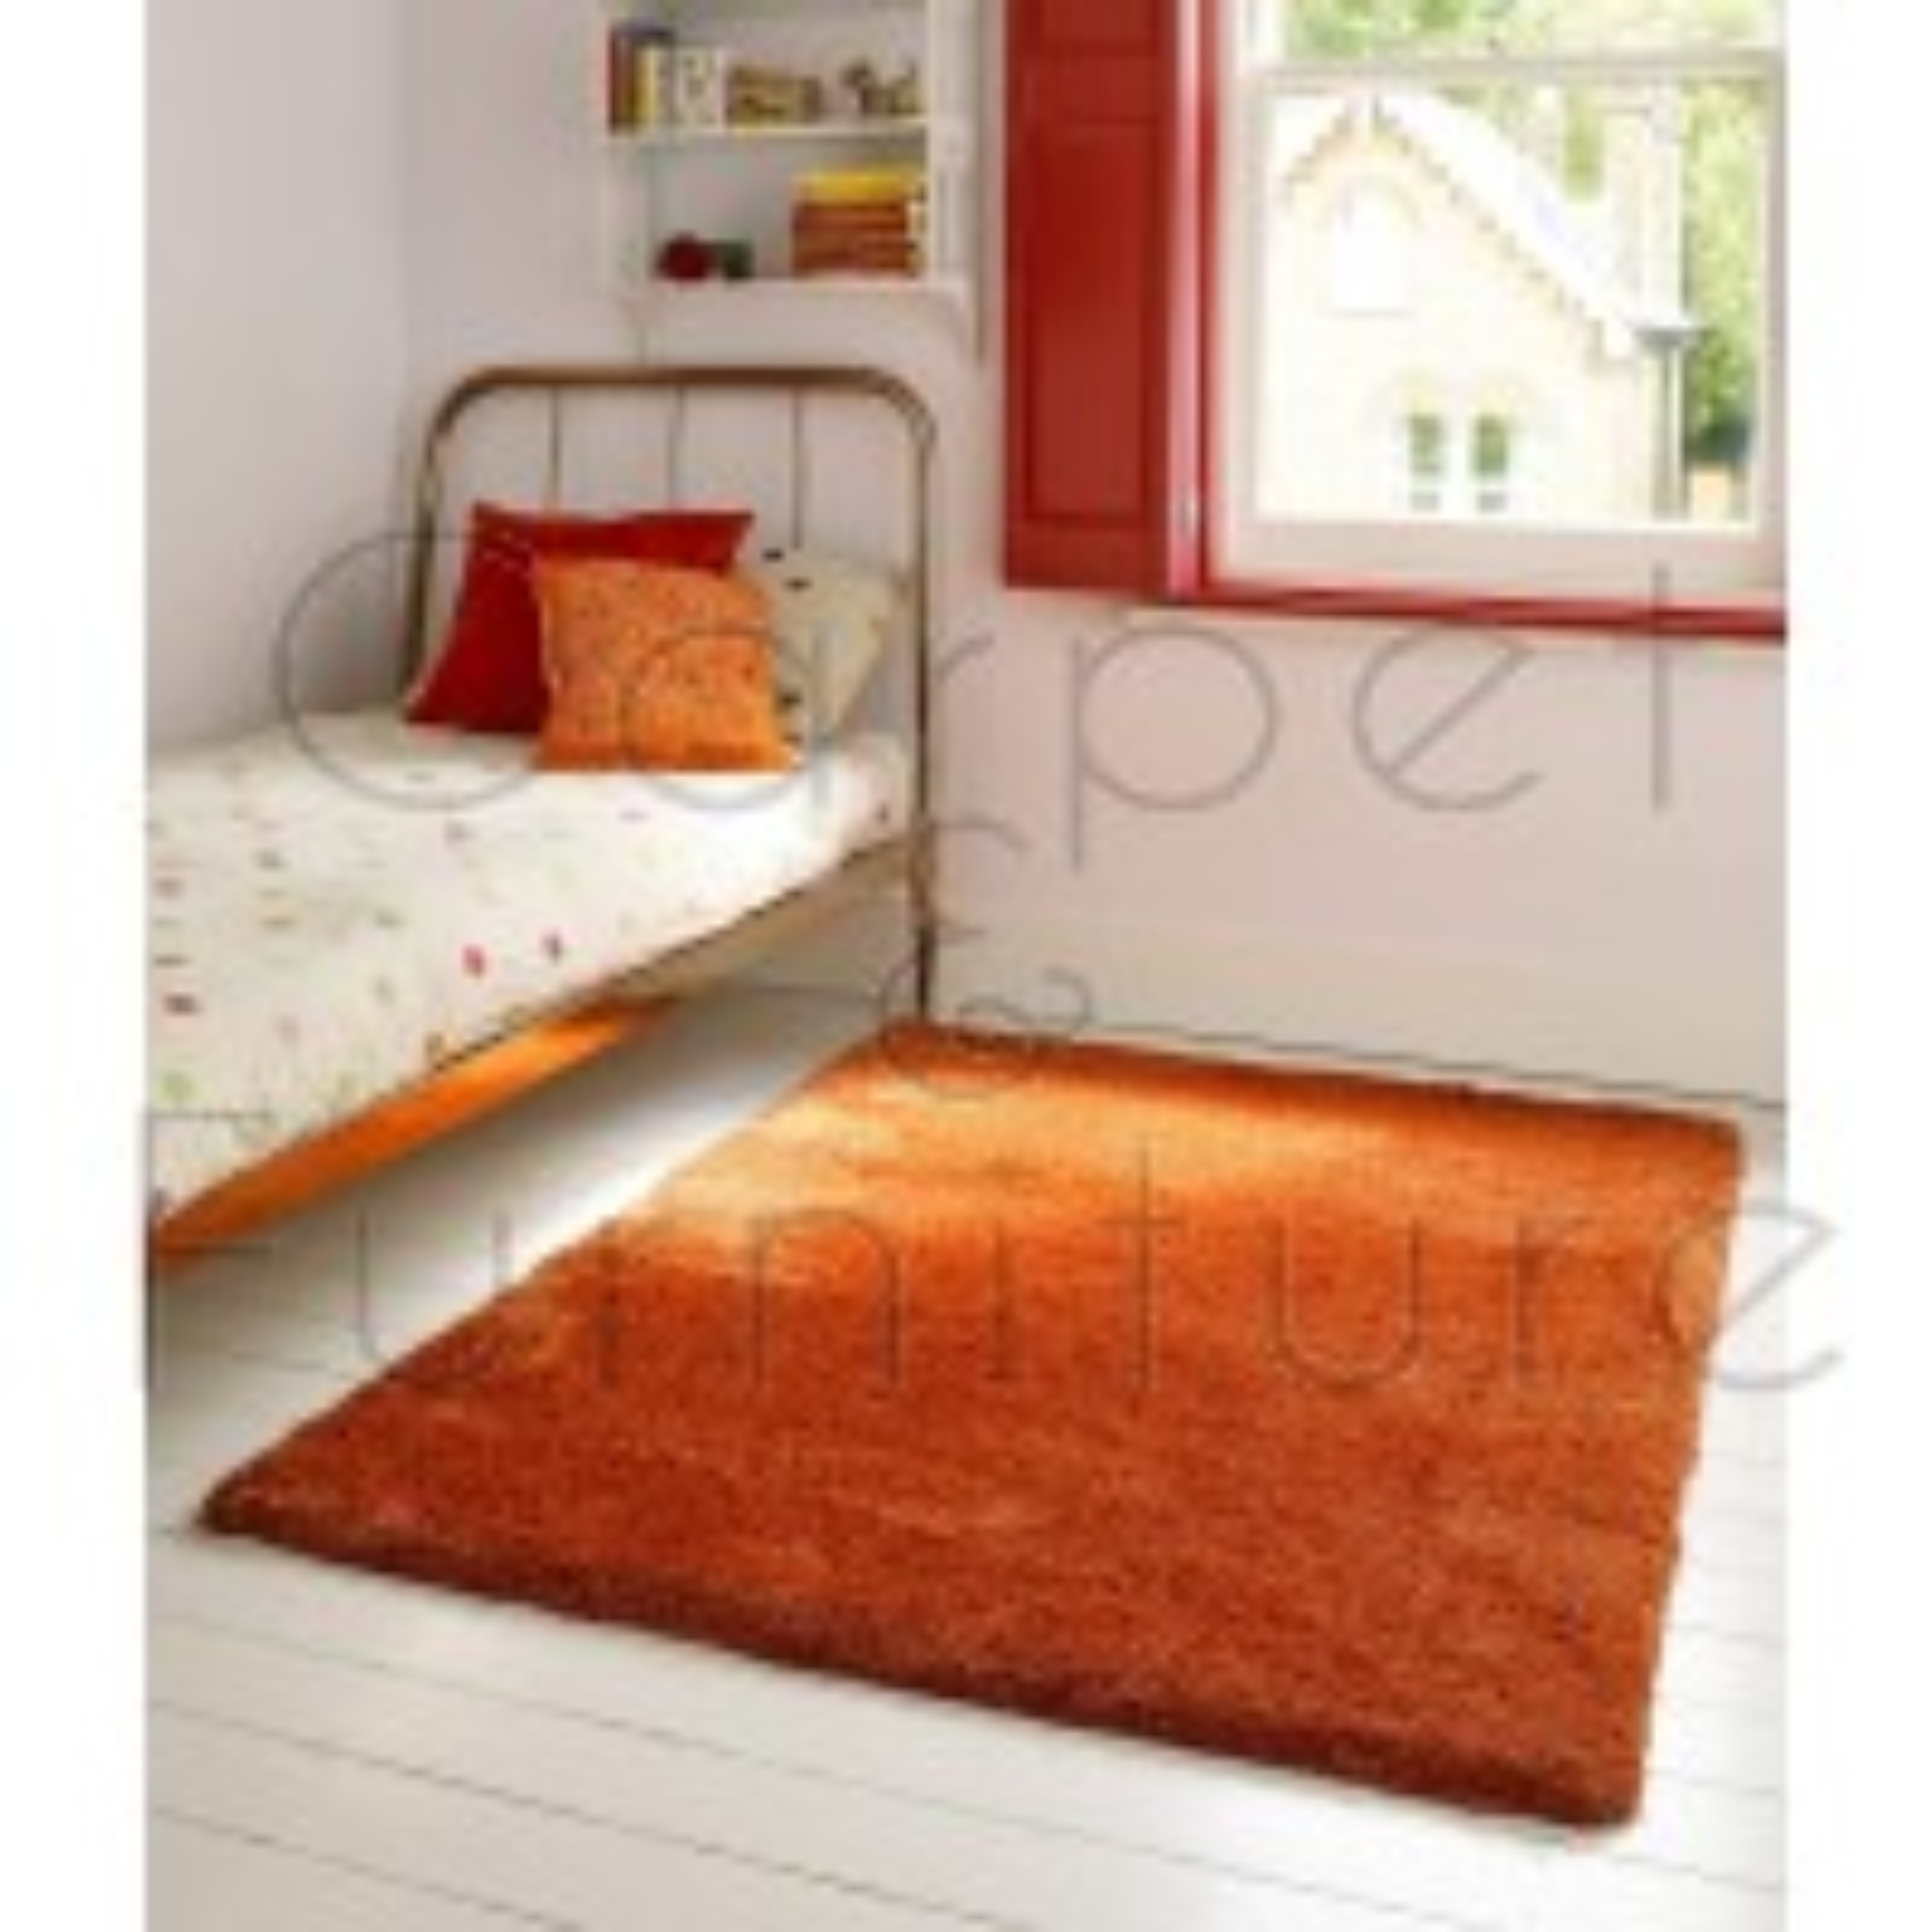 "Lulu Shaggy Rug - Spice - Size 160 x 230 cm (5'3"" x 7'7"")"